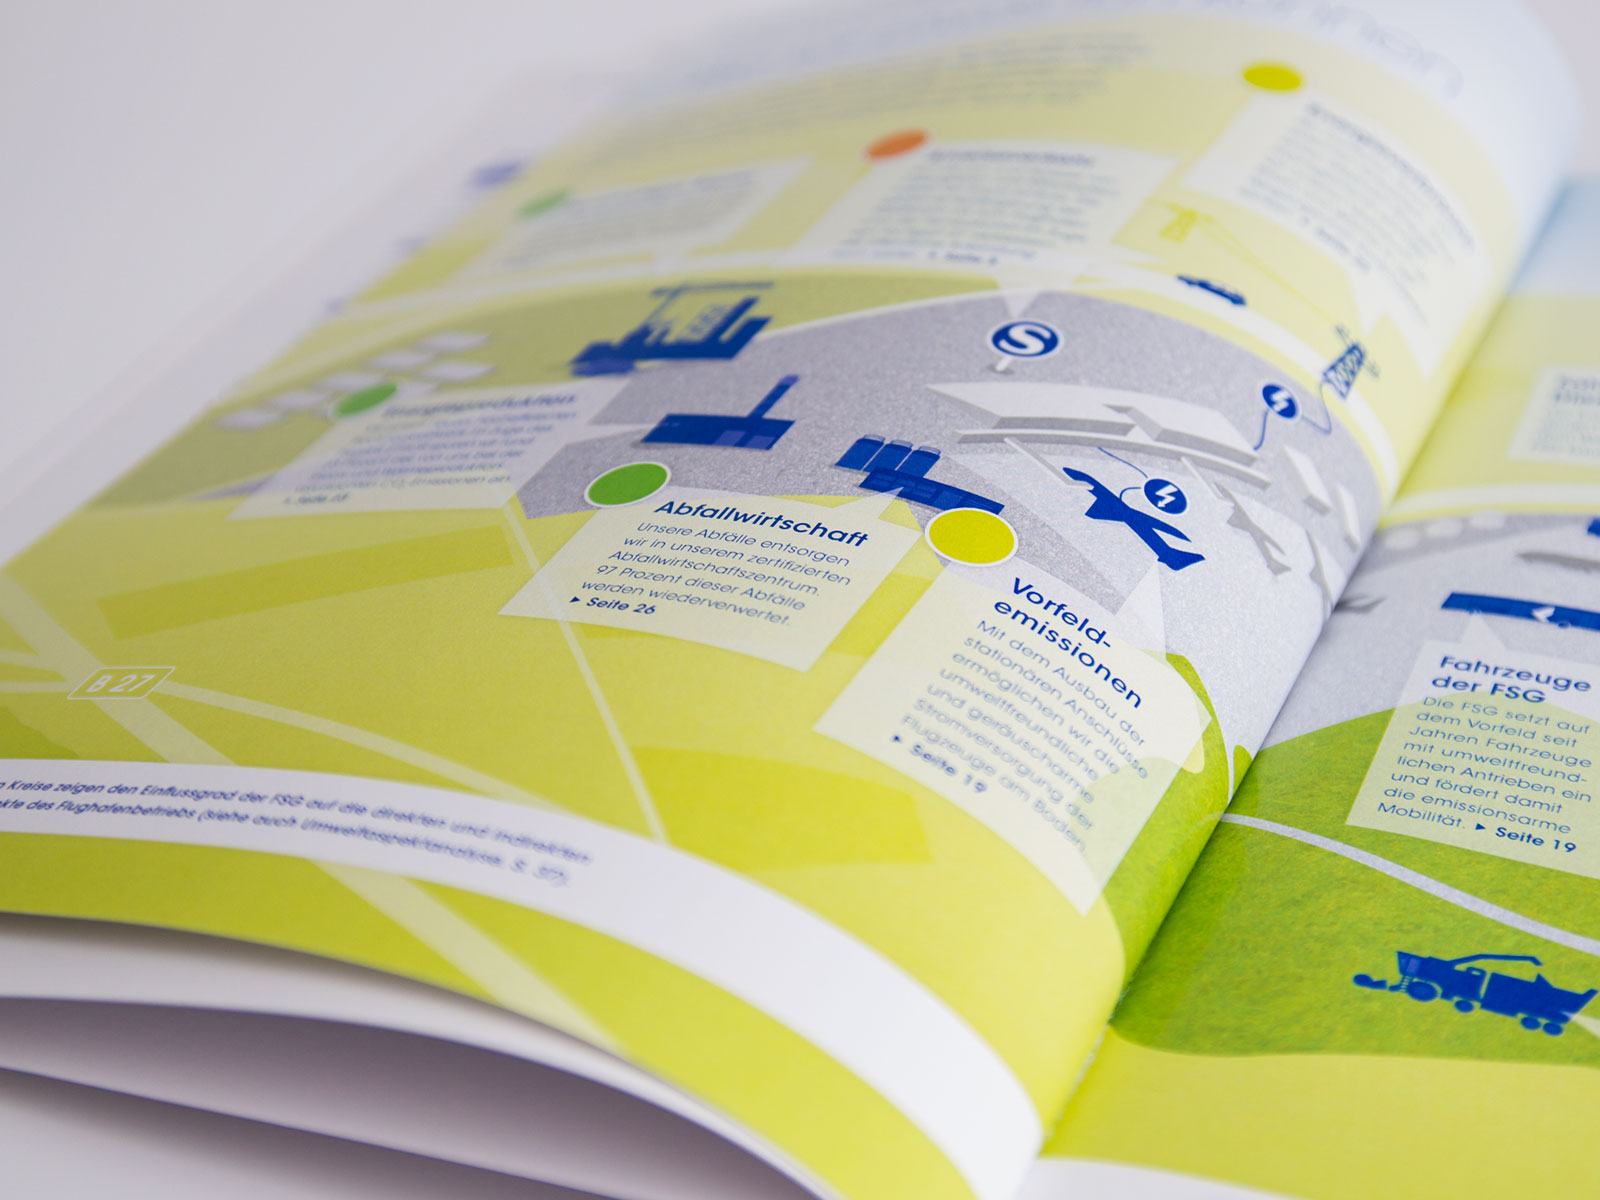 portfiolio_kromativ_corporate_publishing_bericht_fsg_01